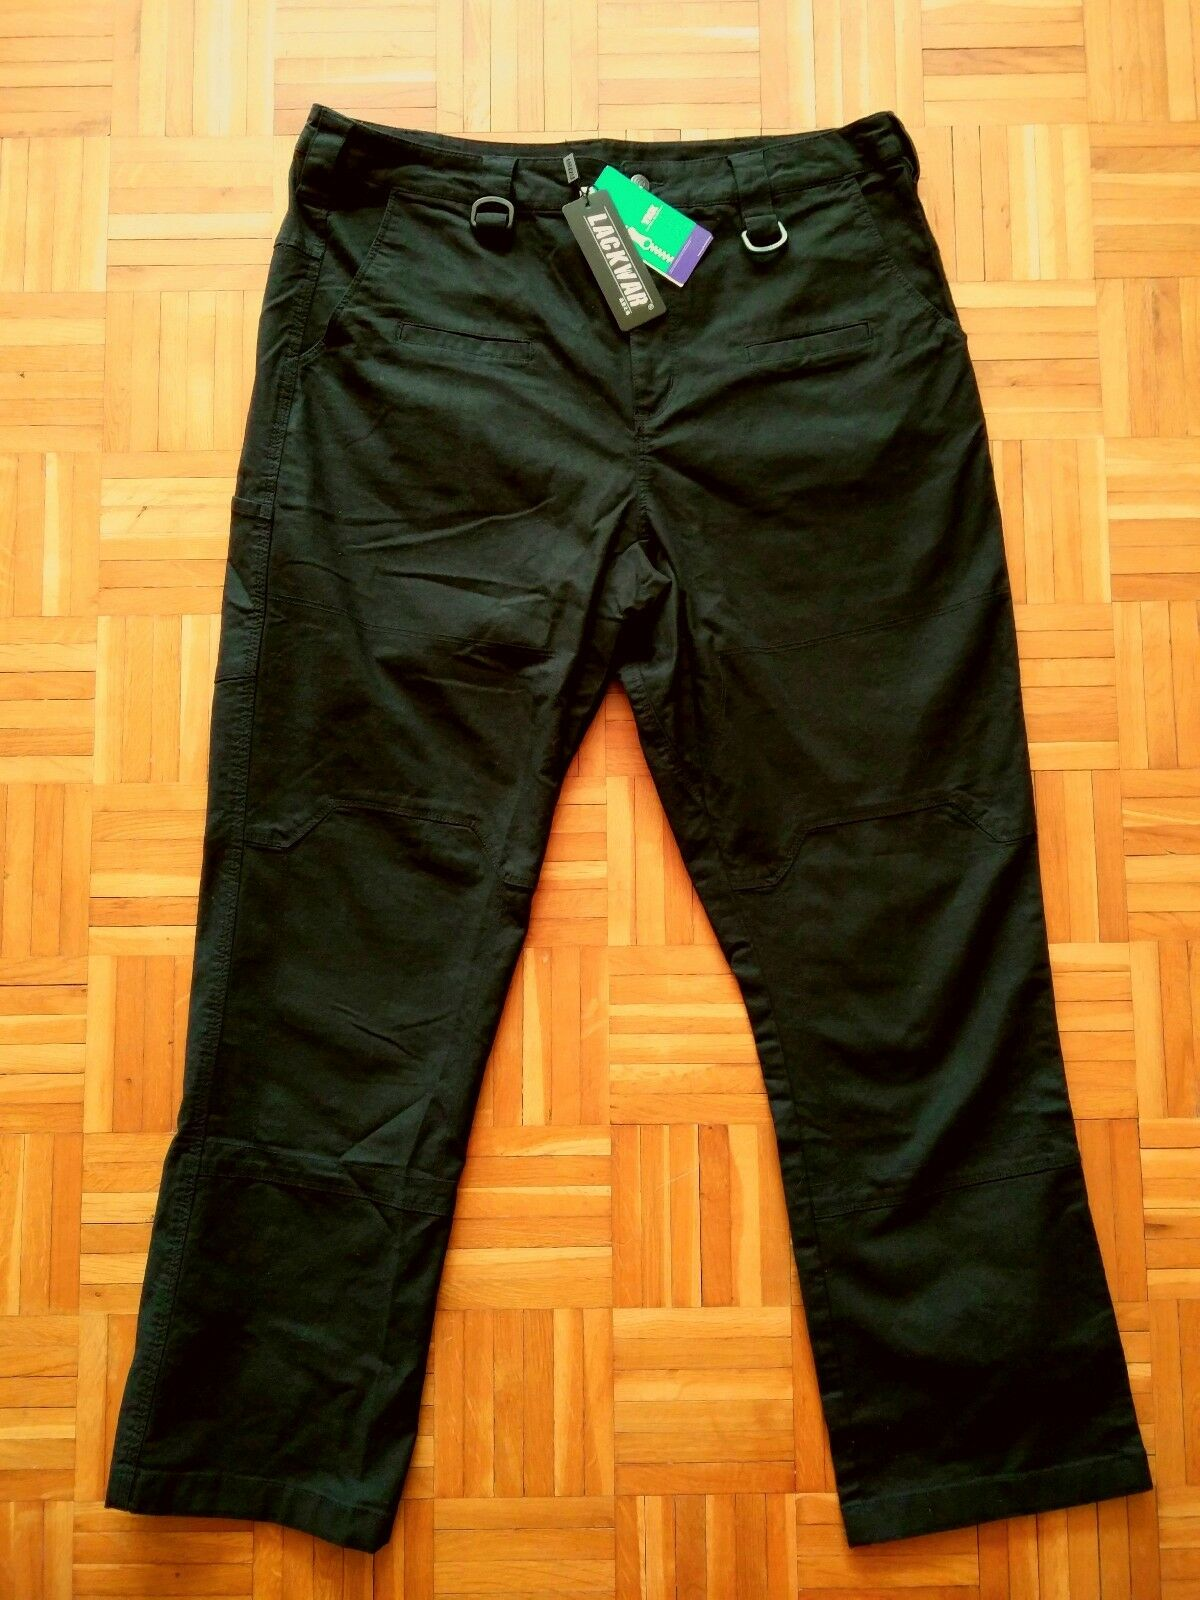 Lackwar CoGrün RS Tactical Pants (Einsatzhose schwarz W34 L32)